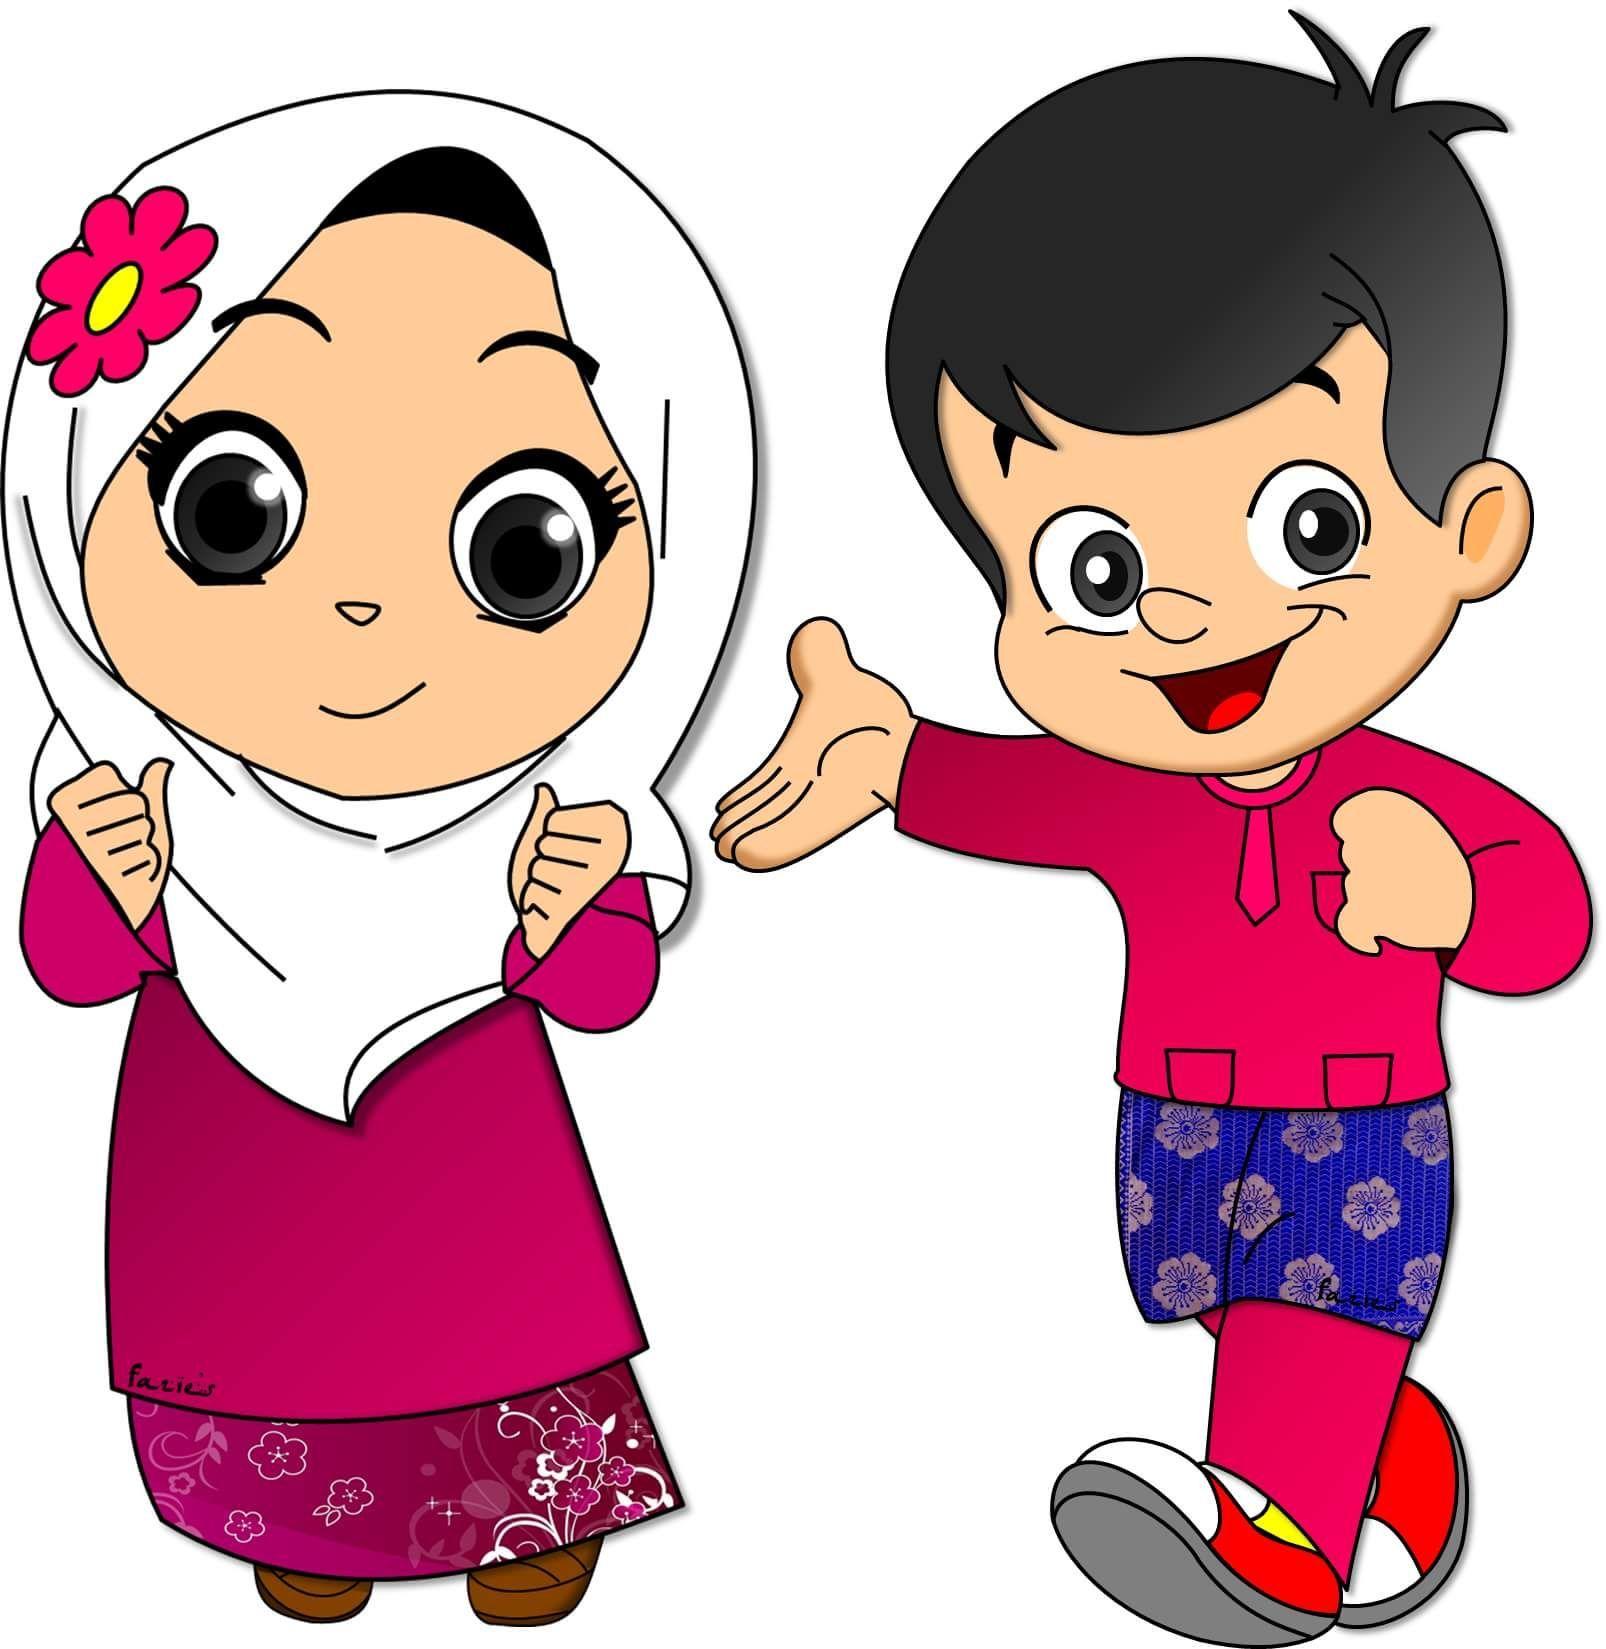 Gambar Kartun Anak Muslim Vector Kartun, Animasi, Gambar